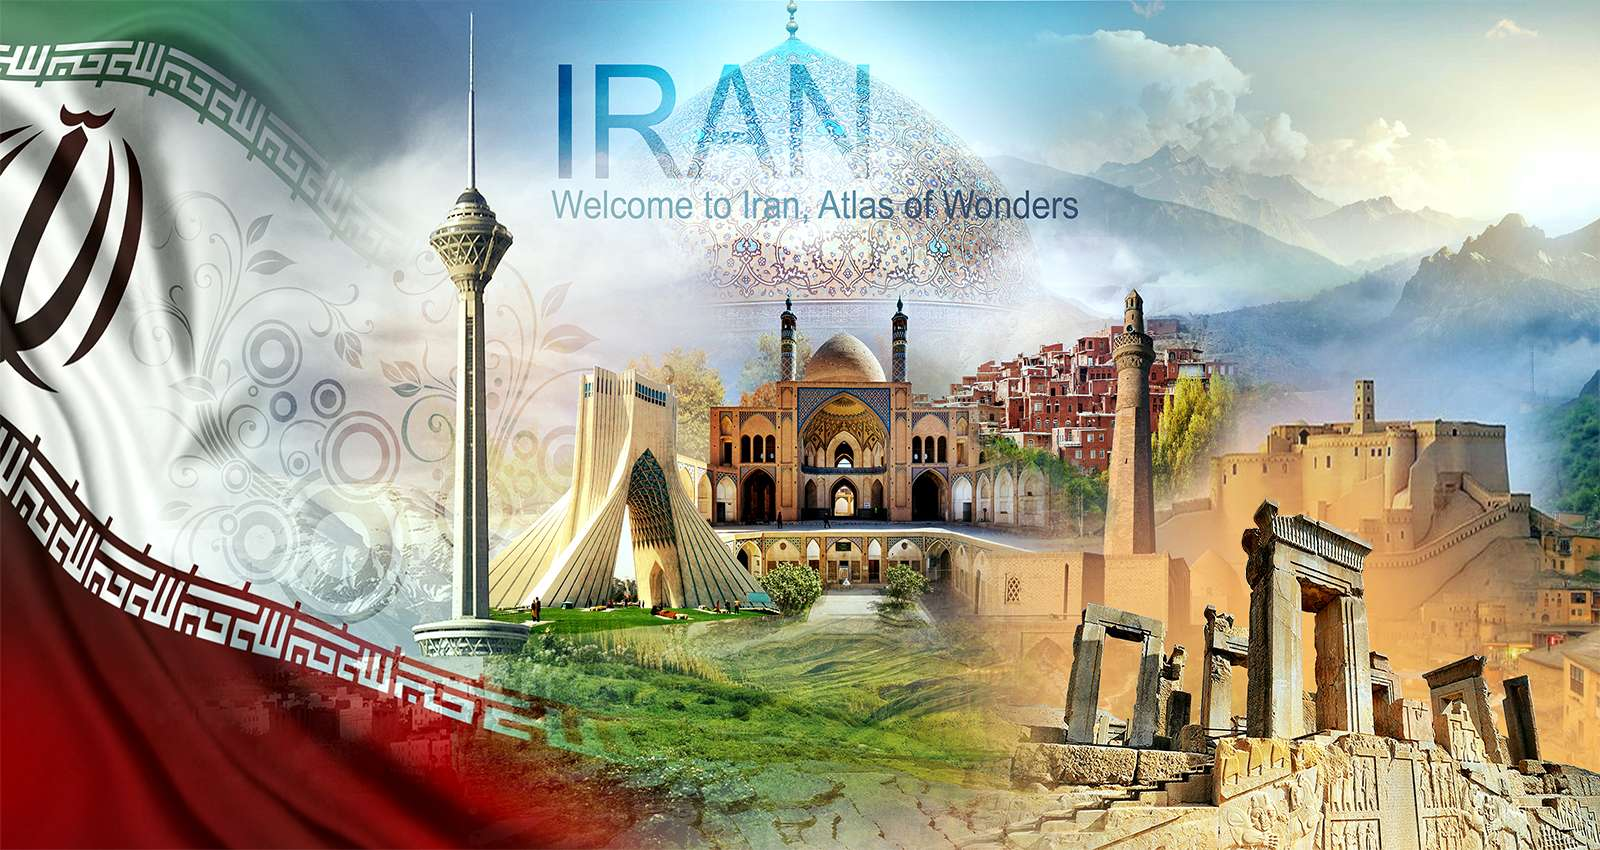 Iran symbols